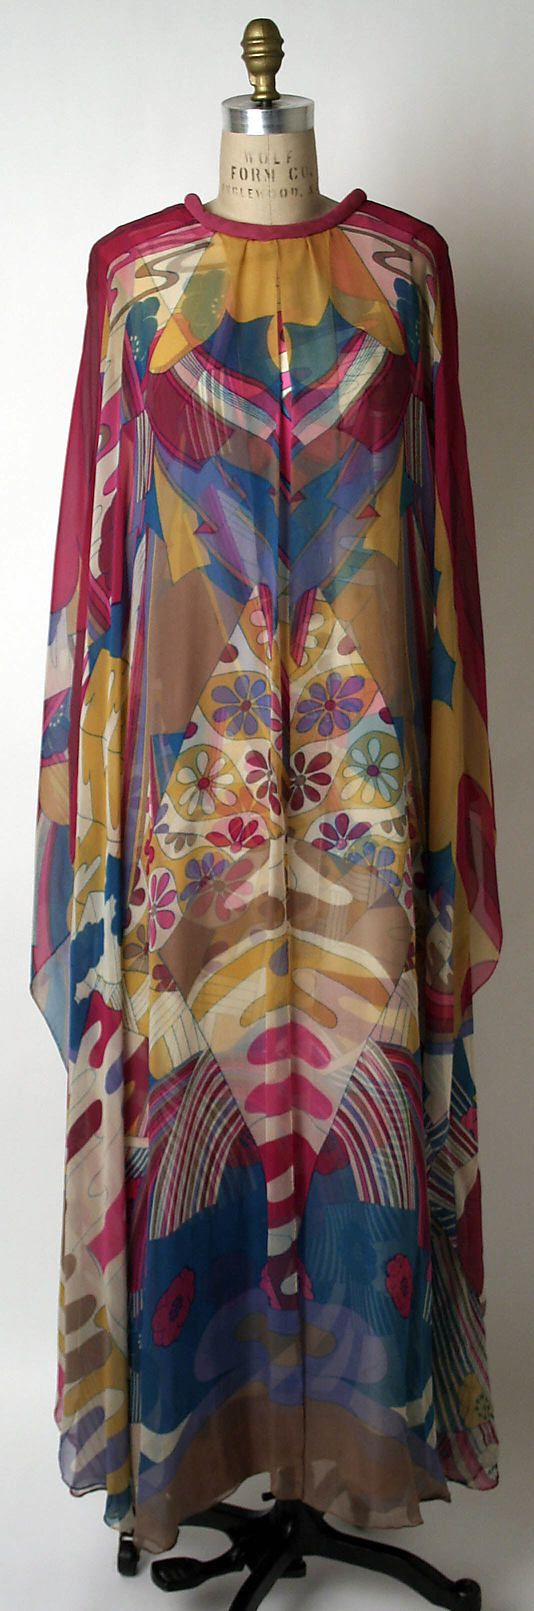 Dress, Evening  Hanae Mori  (Japanese, born 1926)  Date: ca. 1968 Culture: Japanese Medium: silk, rayon Dimensions: Length at CB: 46 in. (116.8 cm)